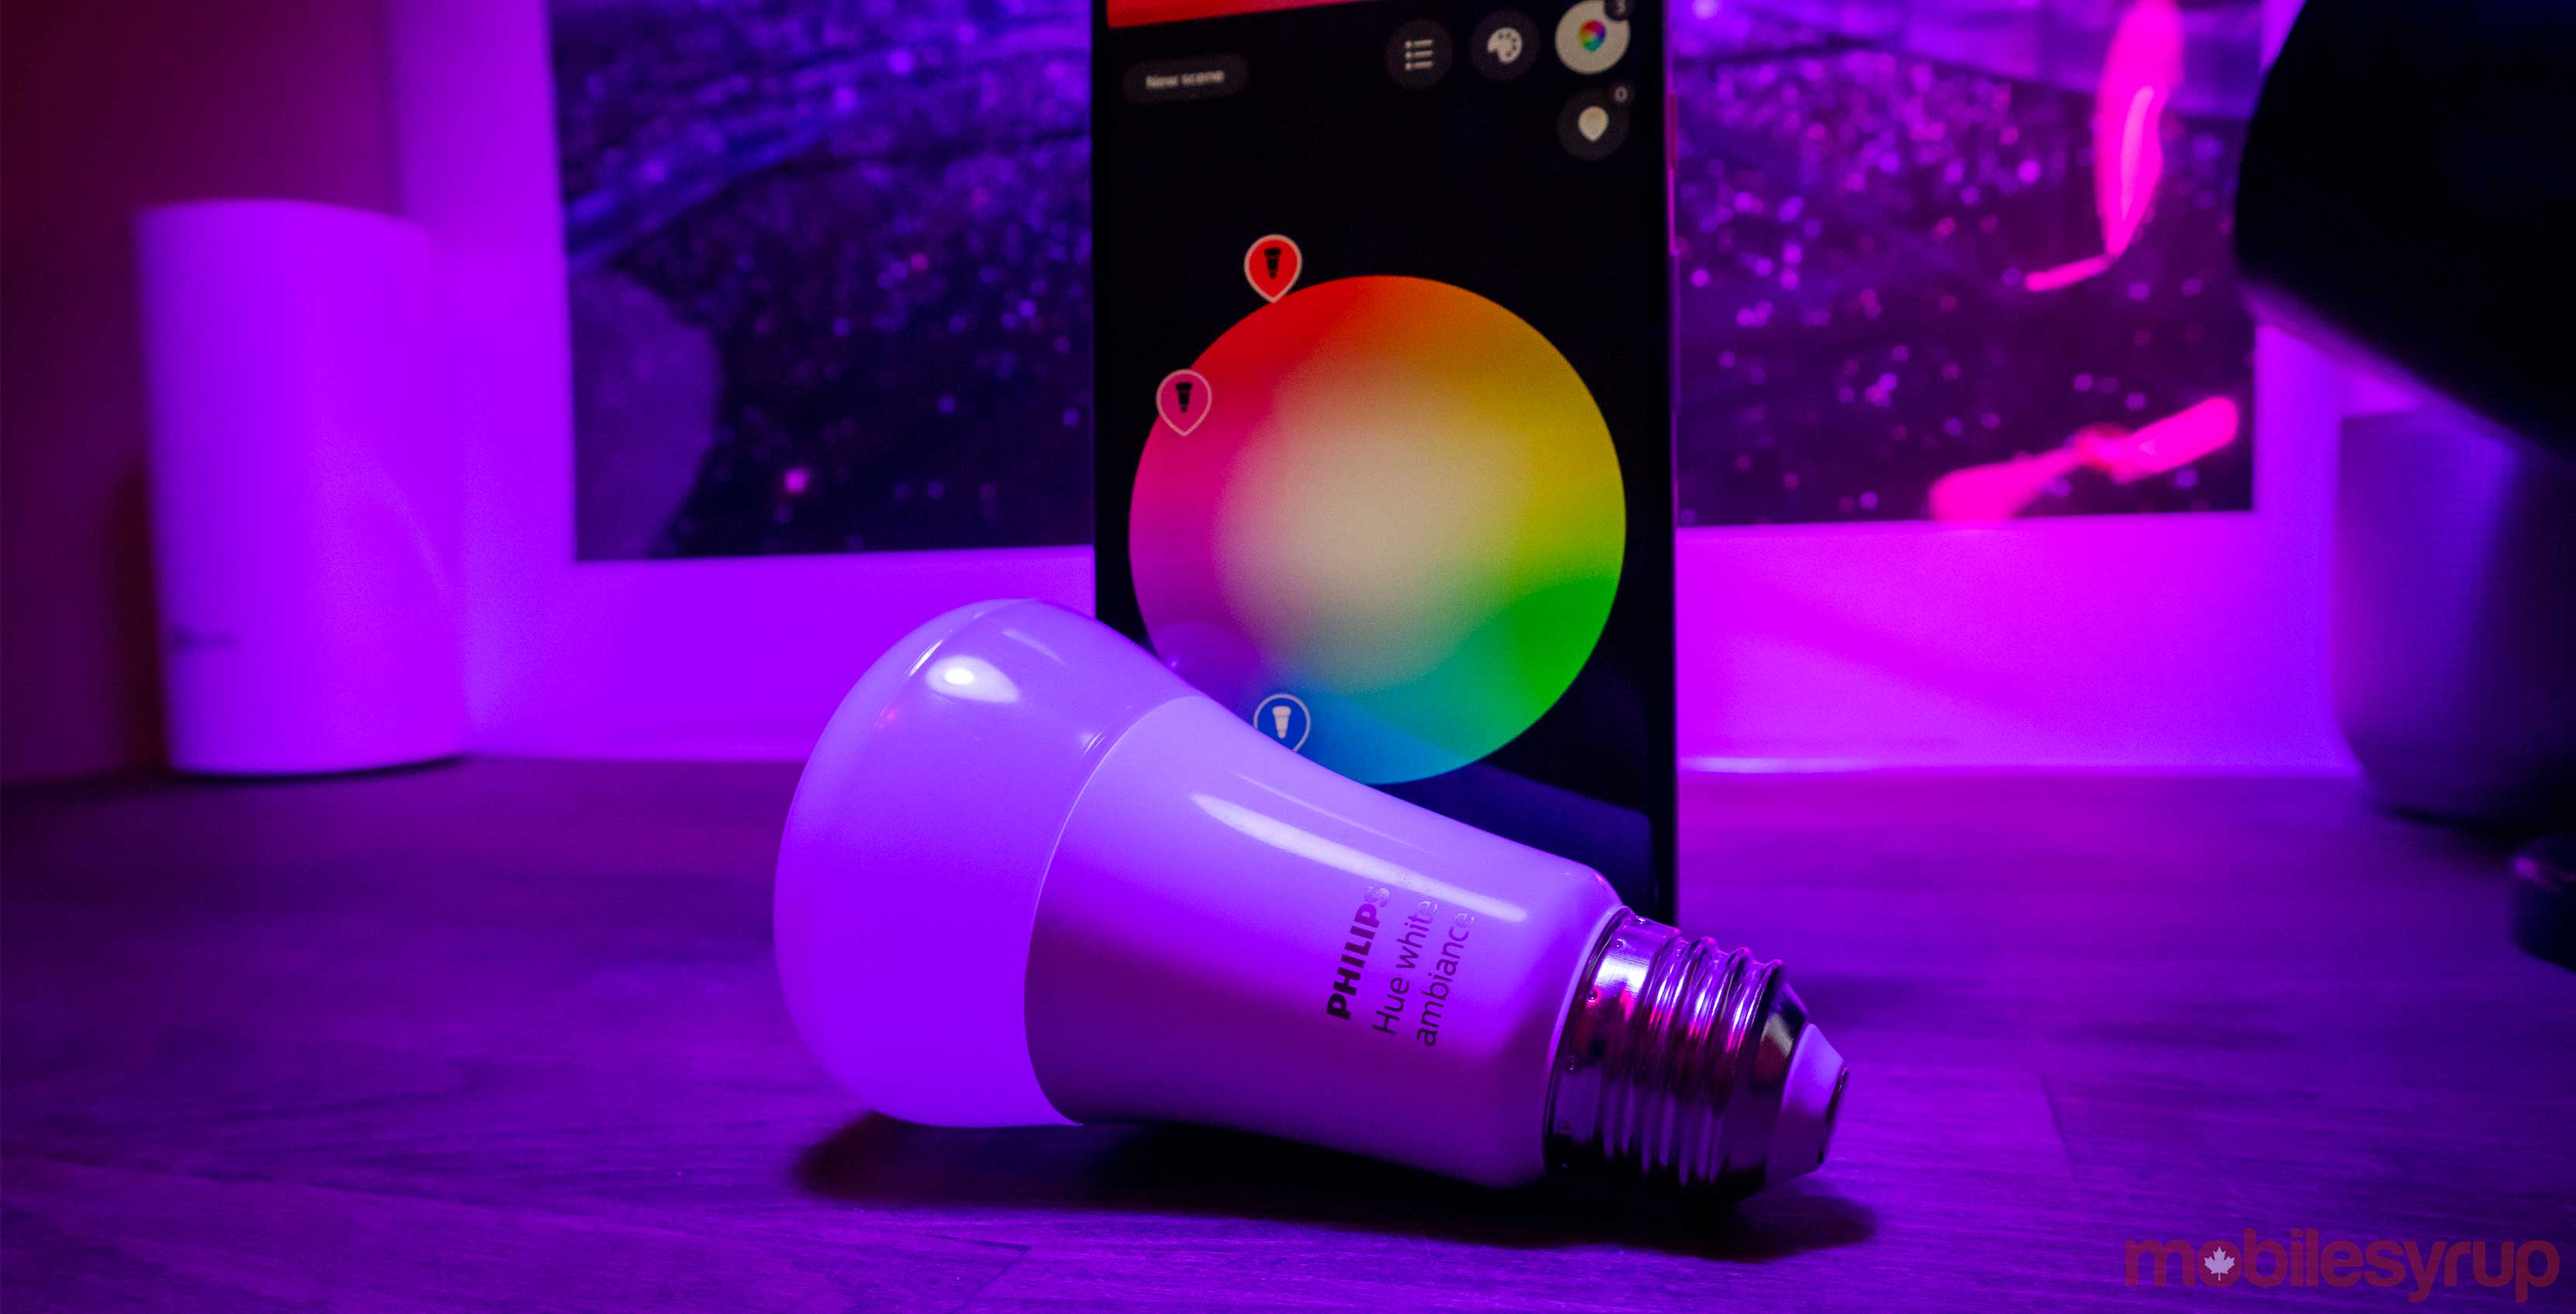 Philips Hue Bluetooth: The perfect starter smart light